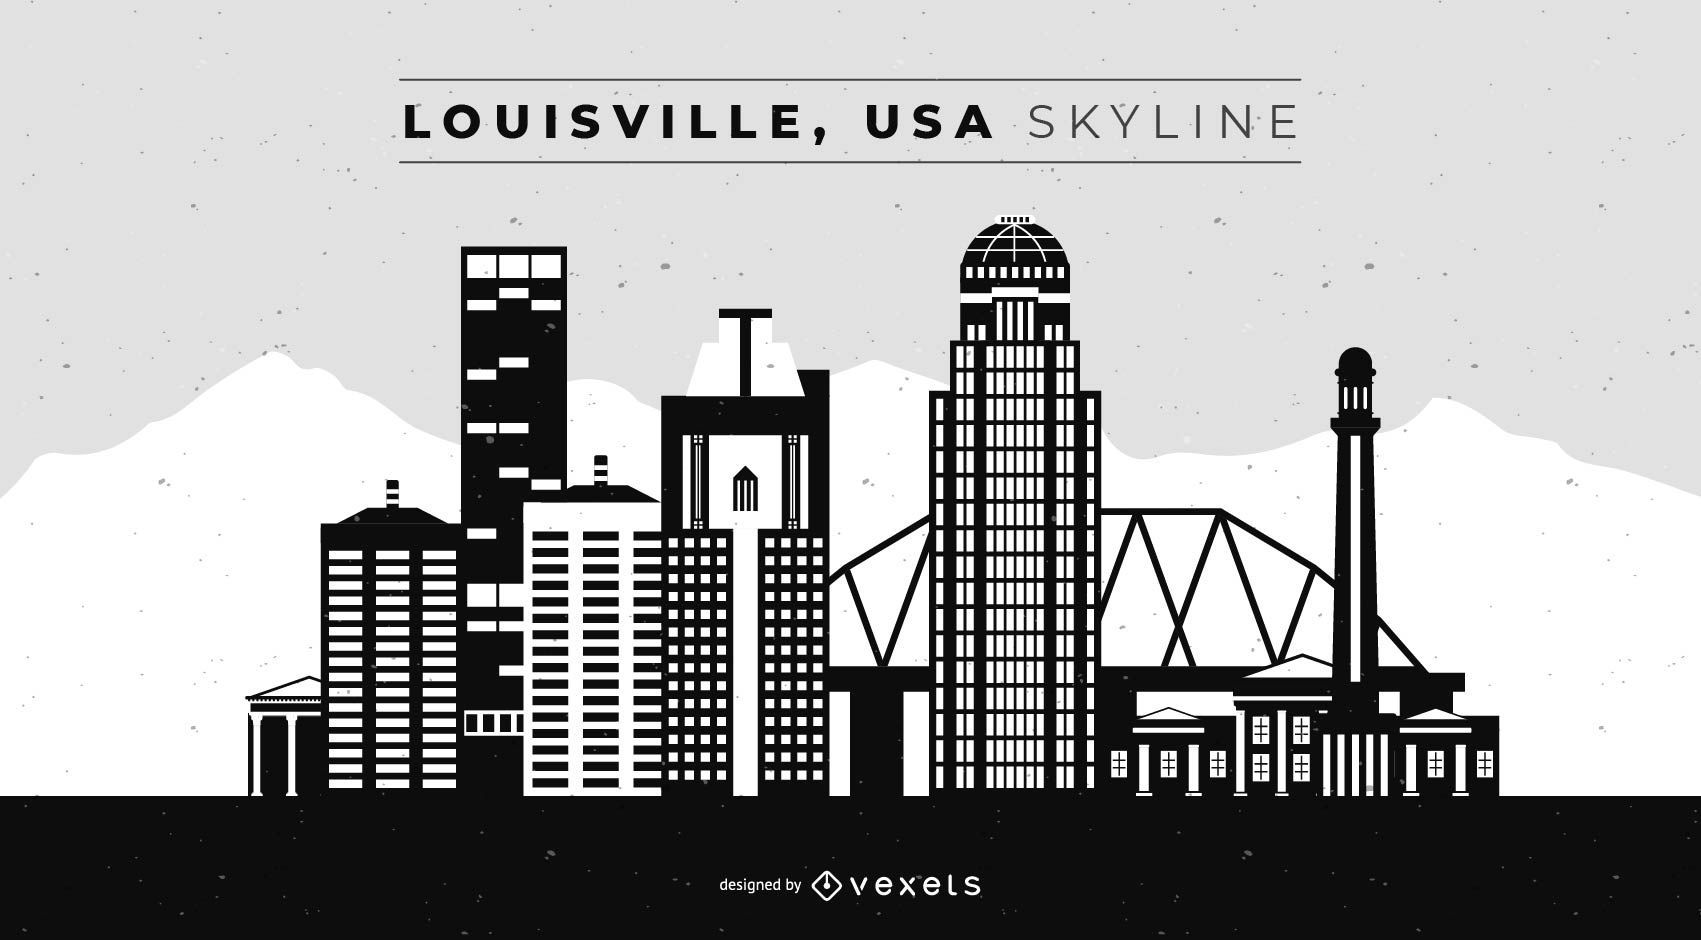 Louisville USA Skyline Design